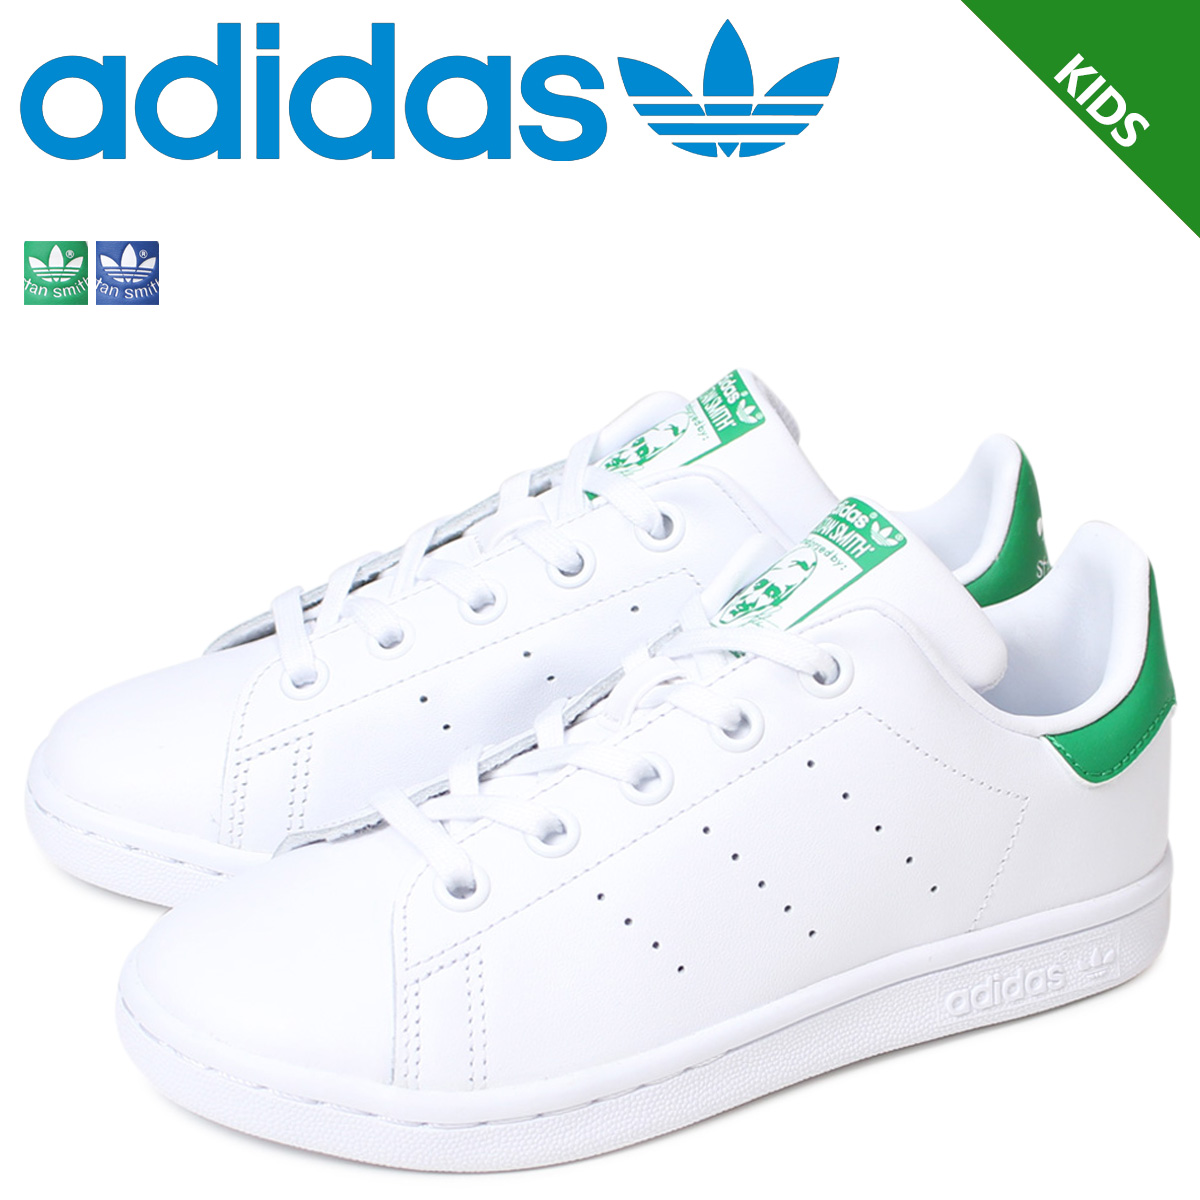 new style b16f6 41515 Adidas Stan Smith kids sneakers adidas originals STAN SMITH EL C BA8375  BA0694 shoes white